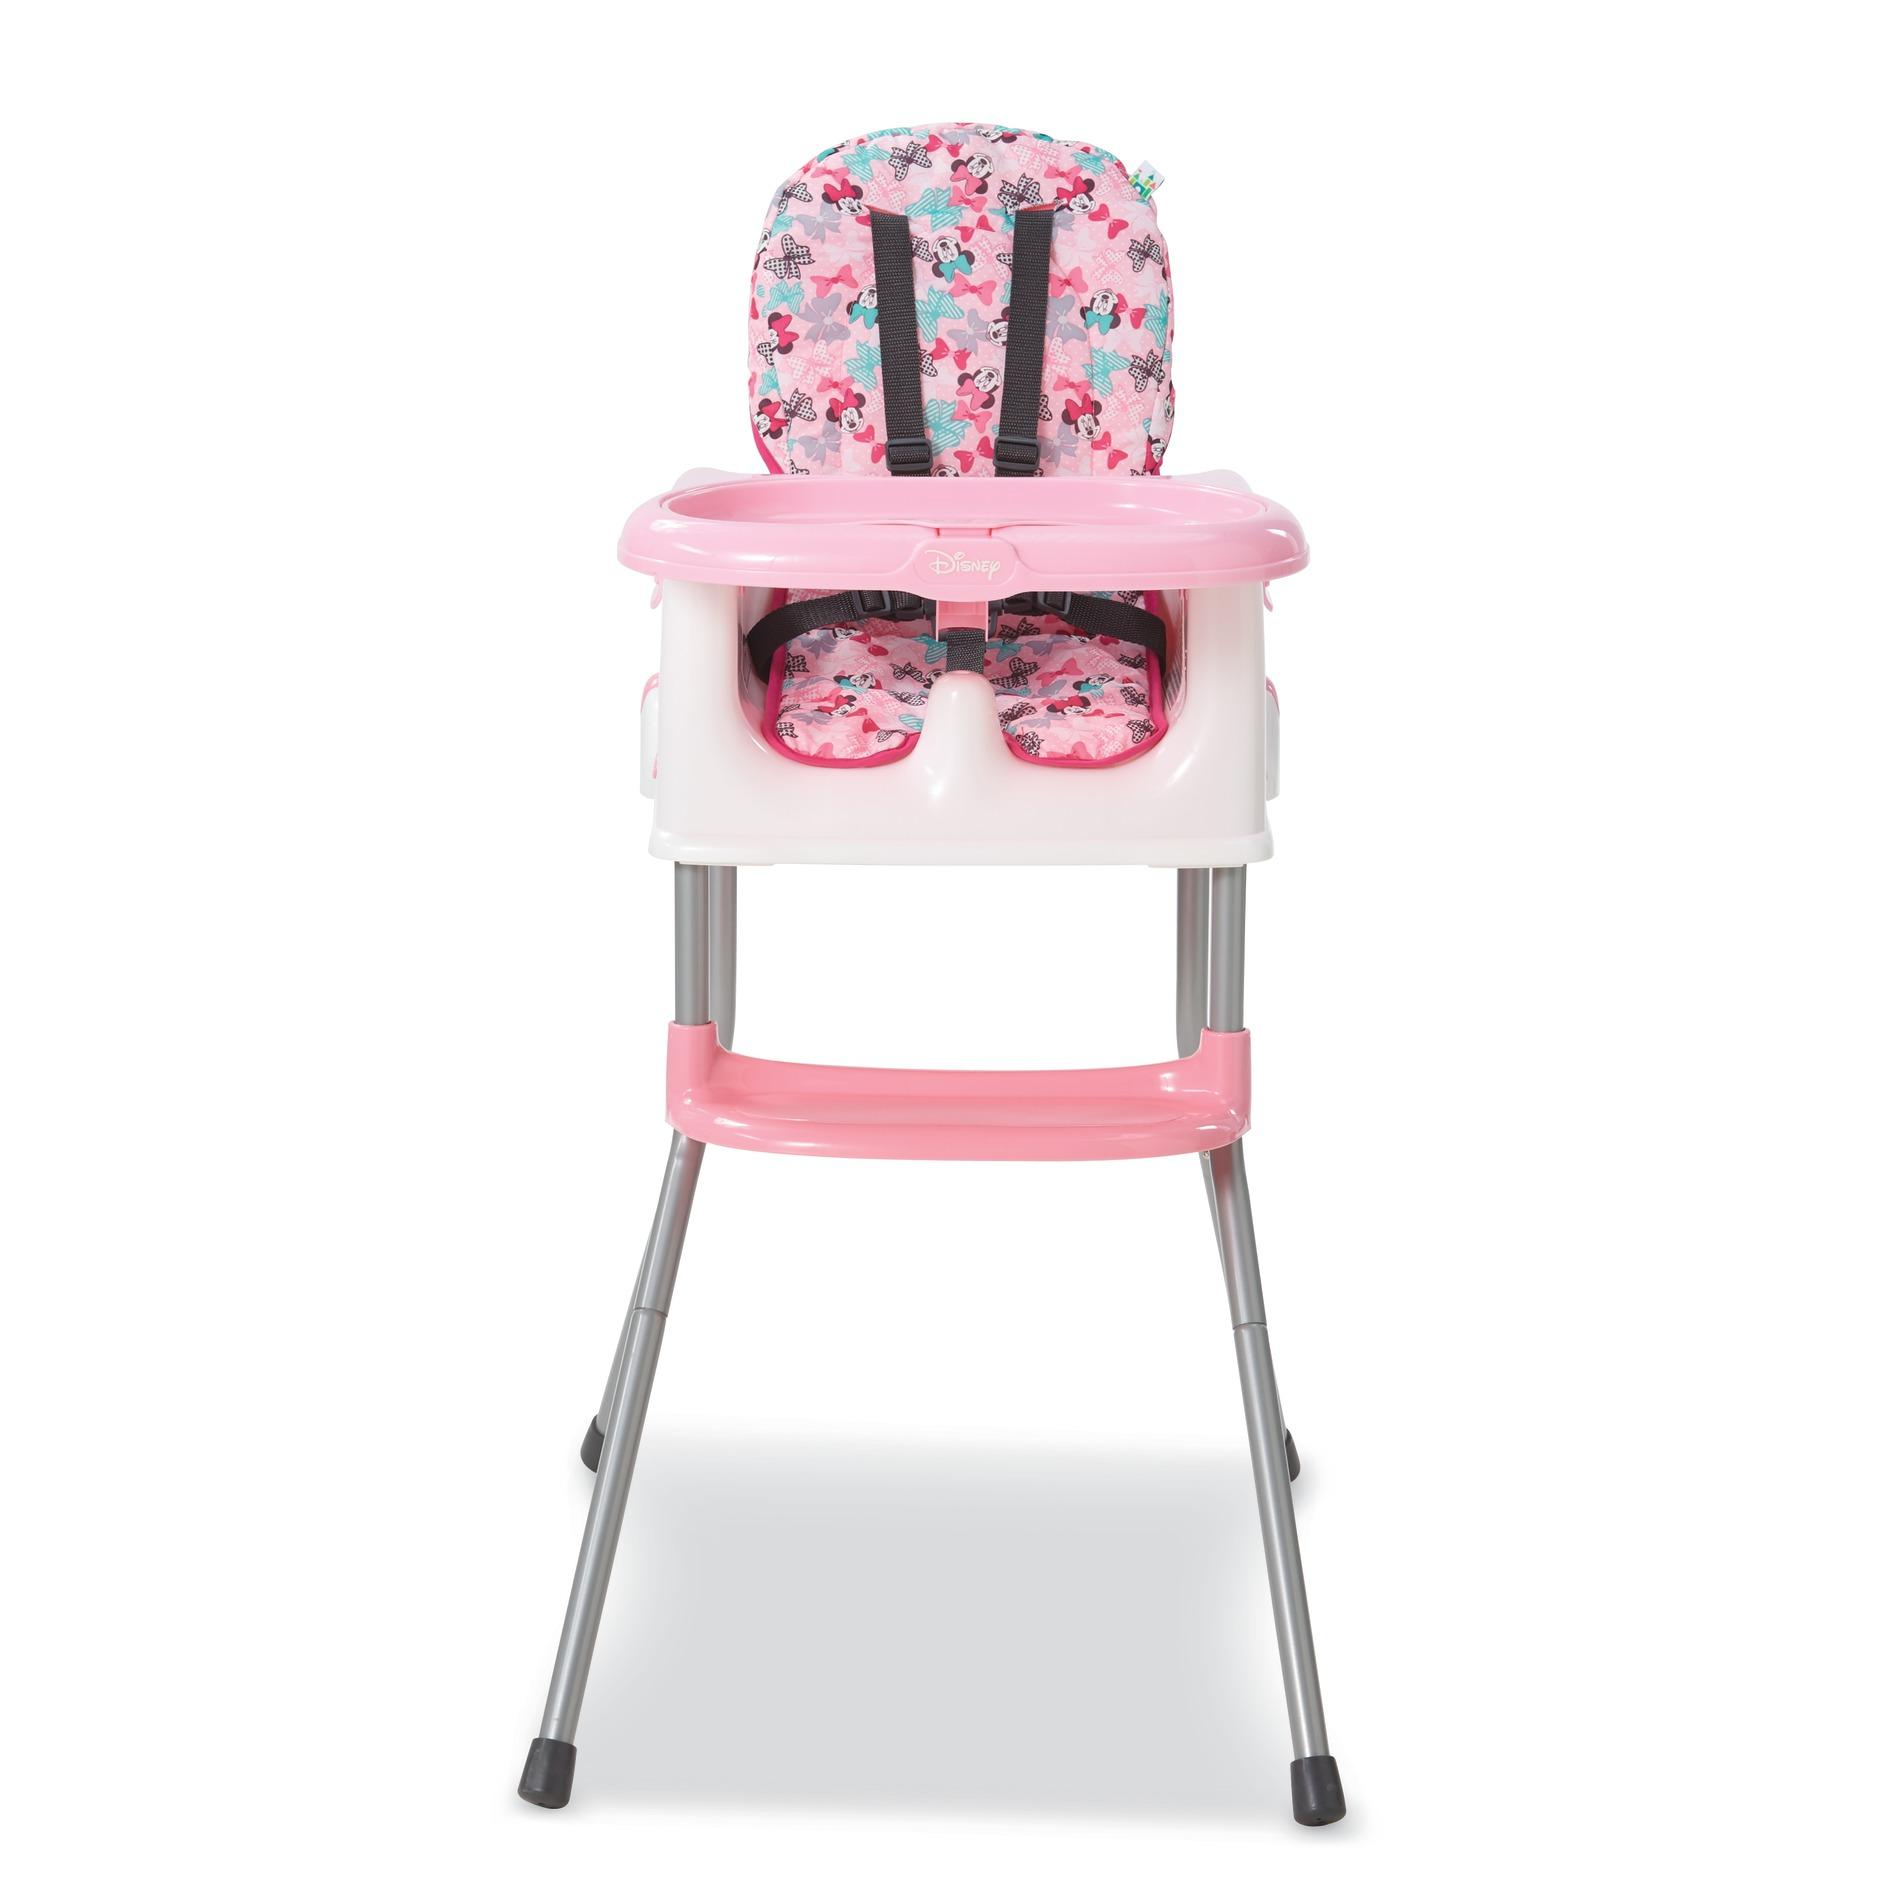 b kitchen high chairs Disney Baby Minnie Bowtiful 4 in 1 High Chair